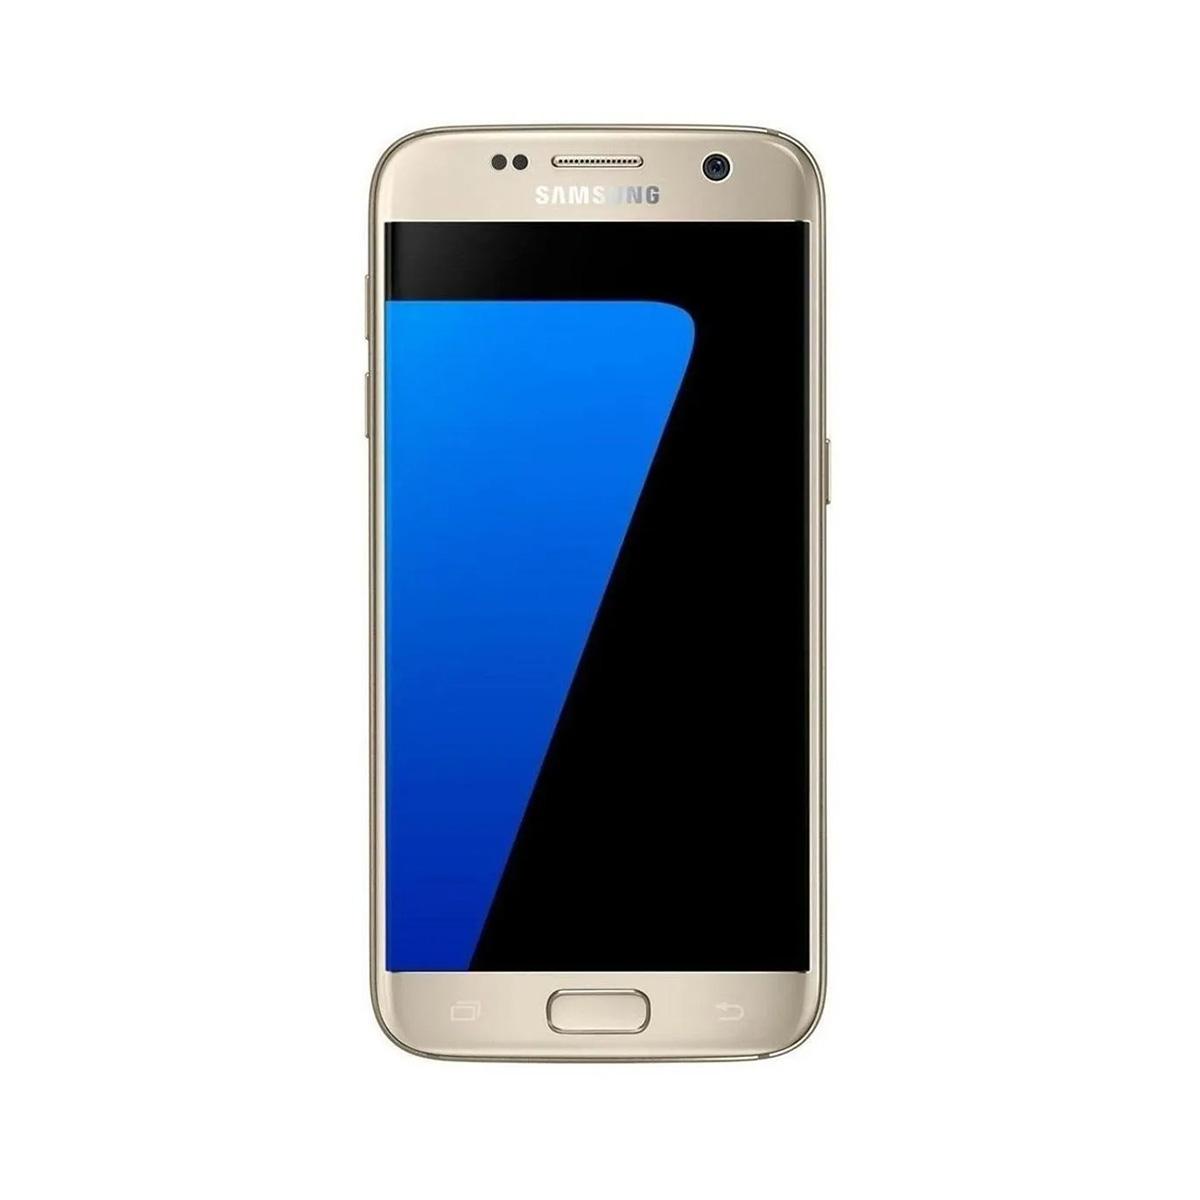 Smartphone Samsung Galaxy S7 G930 32gb Tela 5.1' Mostruário